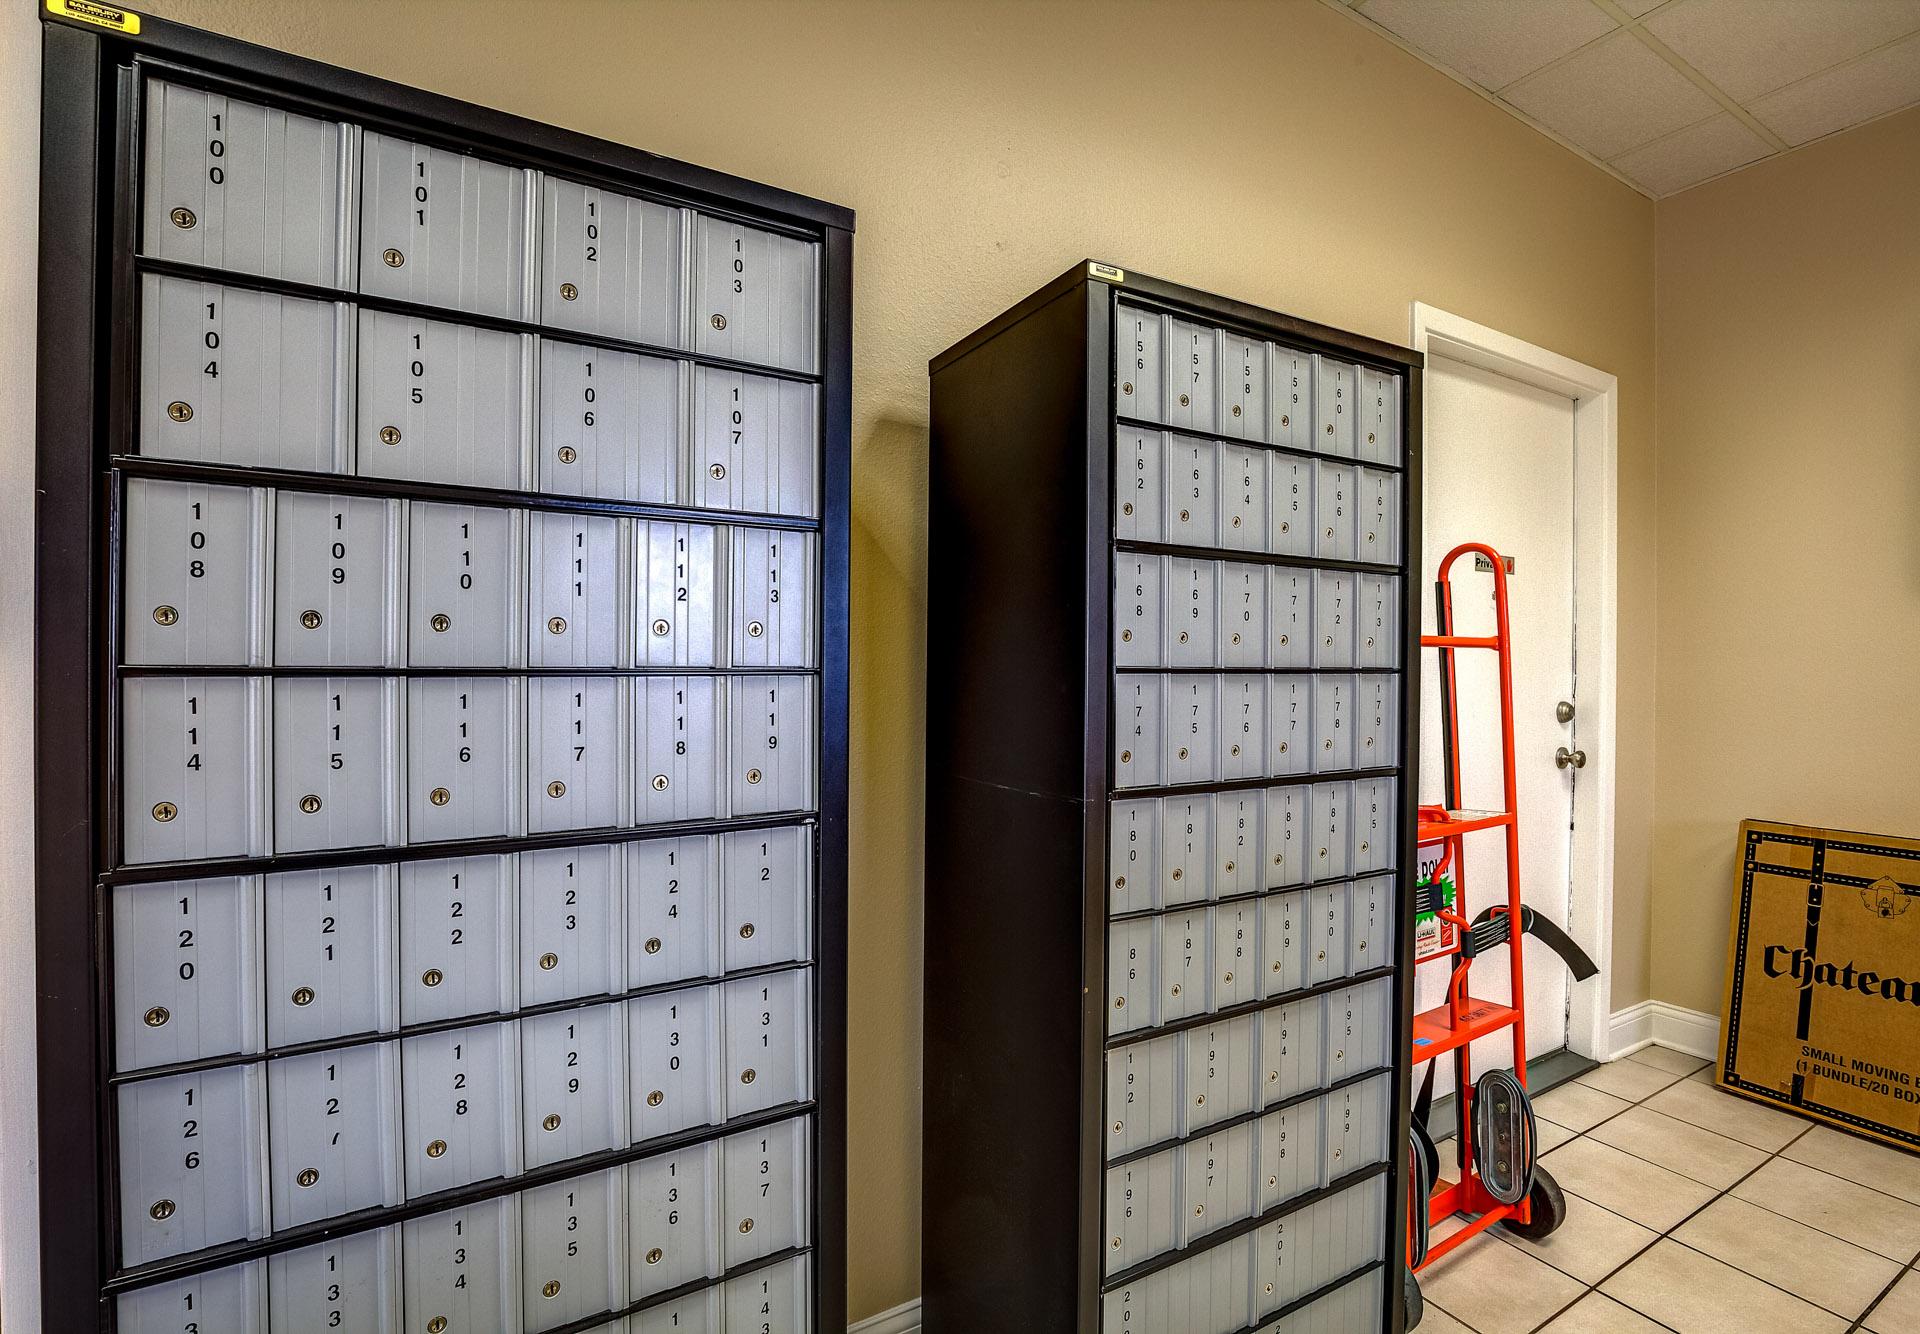 P.O. box rentals with no deposit starting at $30